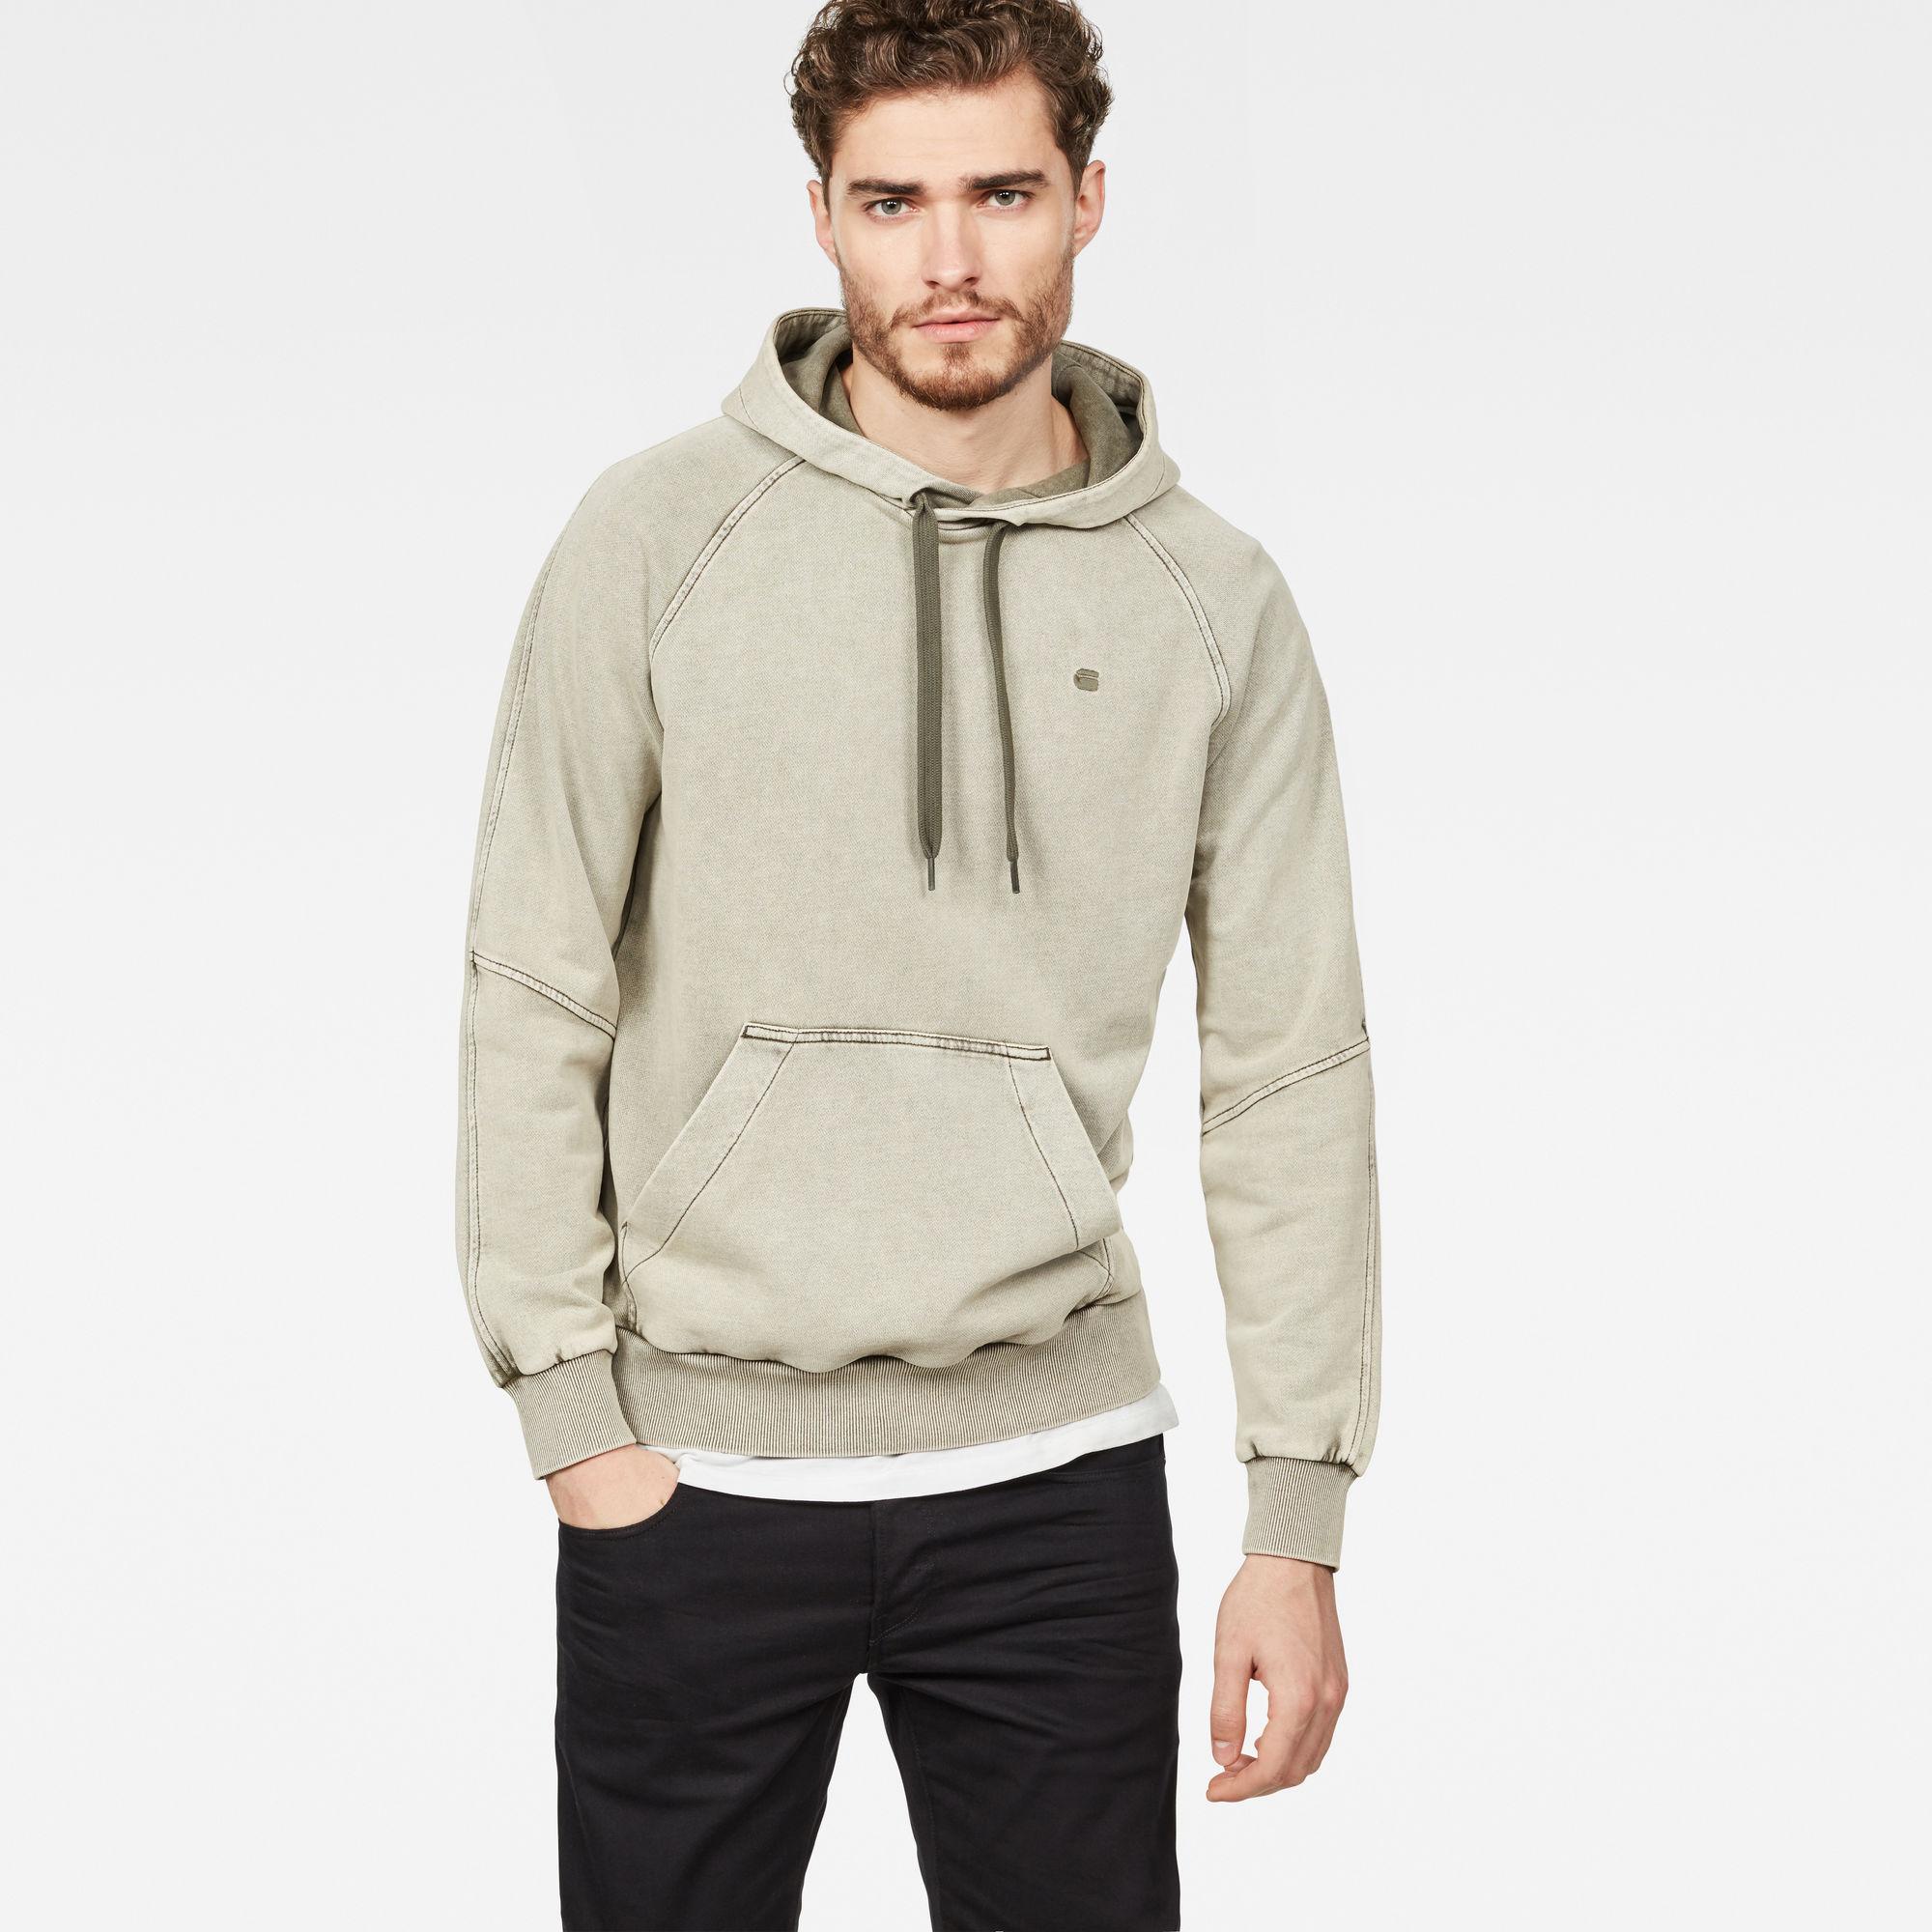 Lyl Strett Deconstructed Hooded Sweater